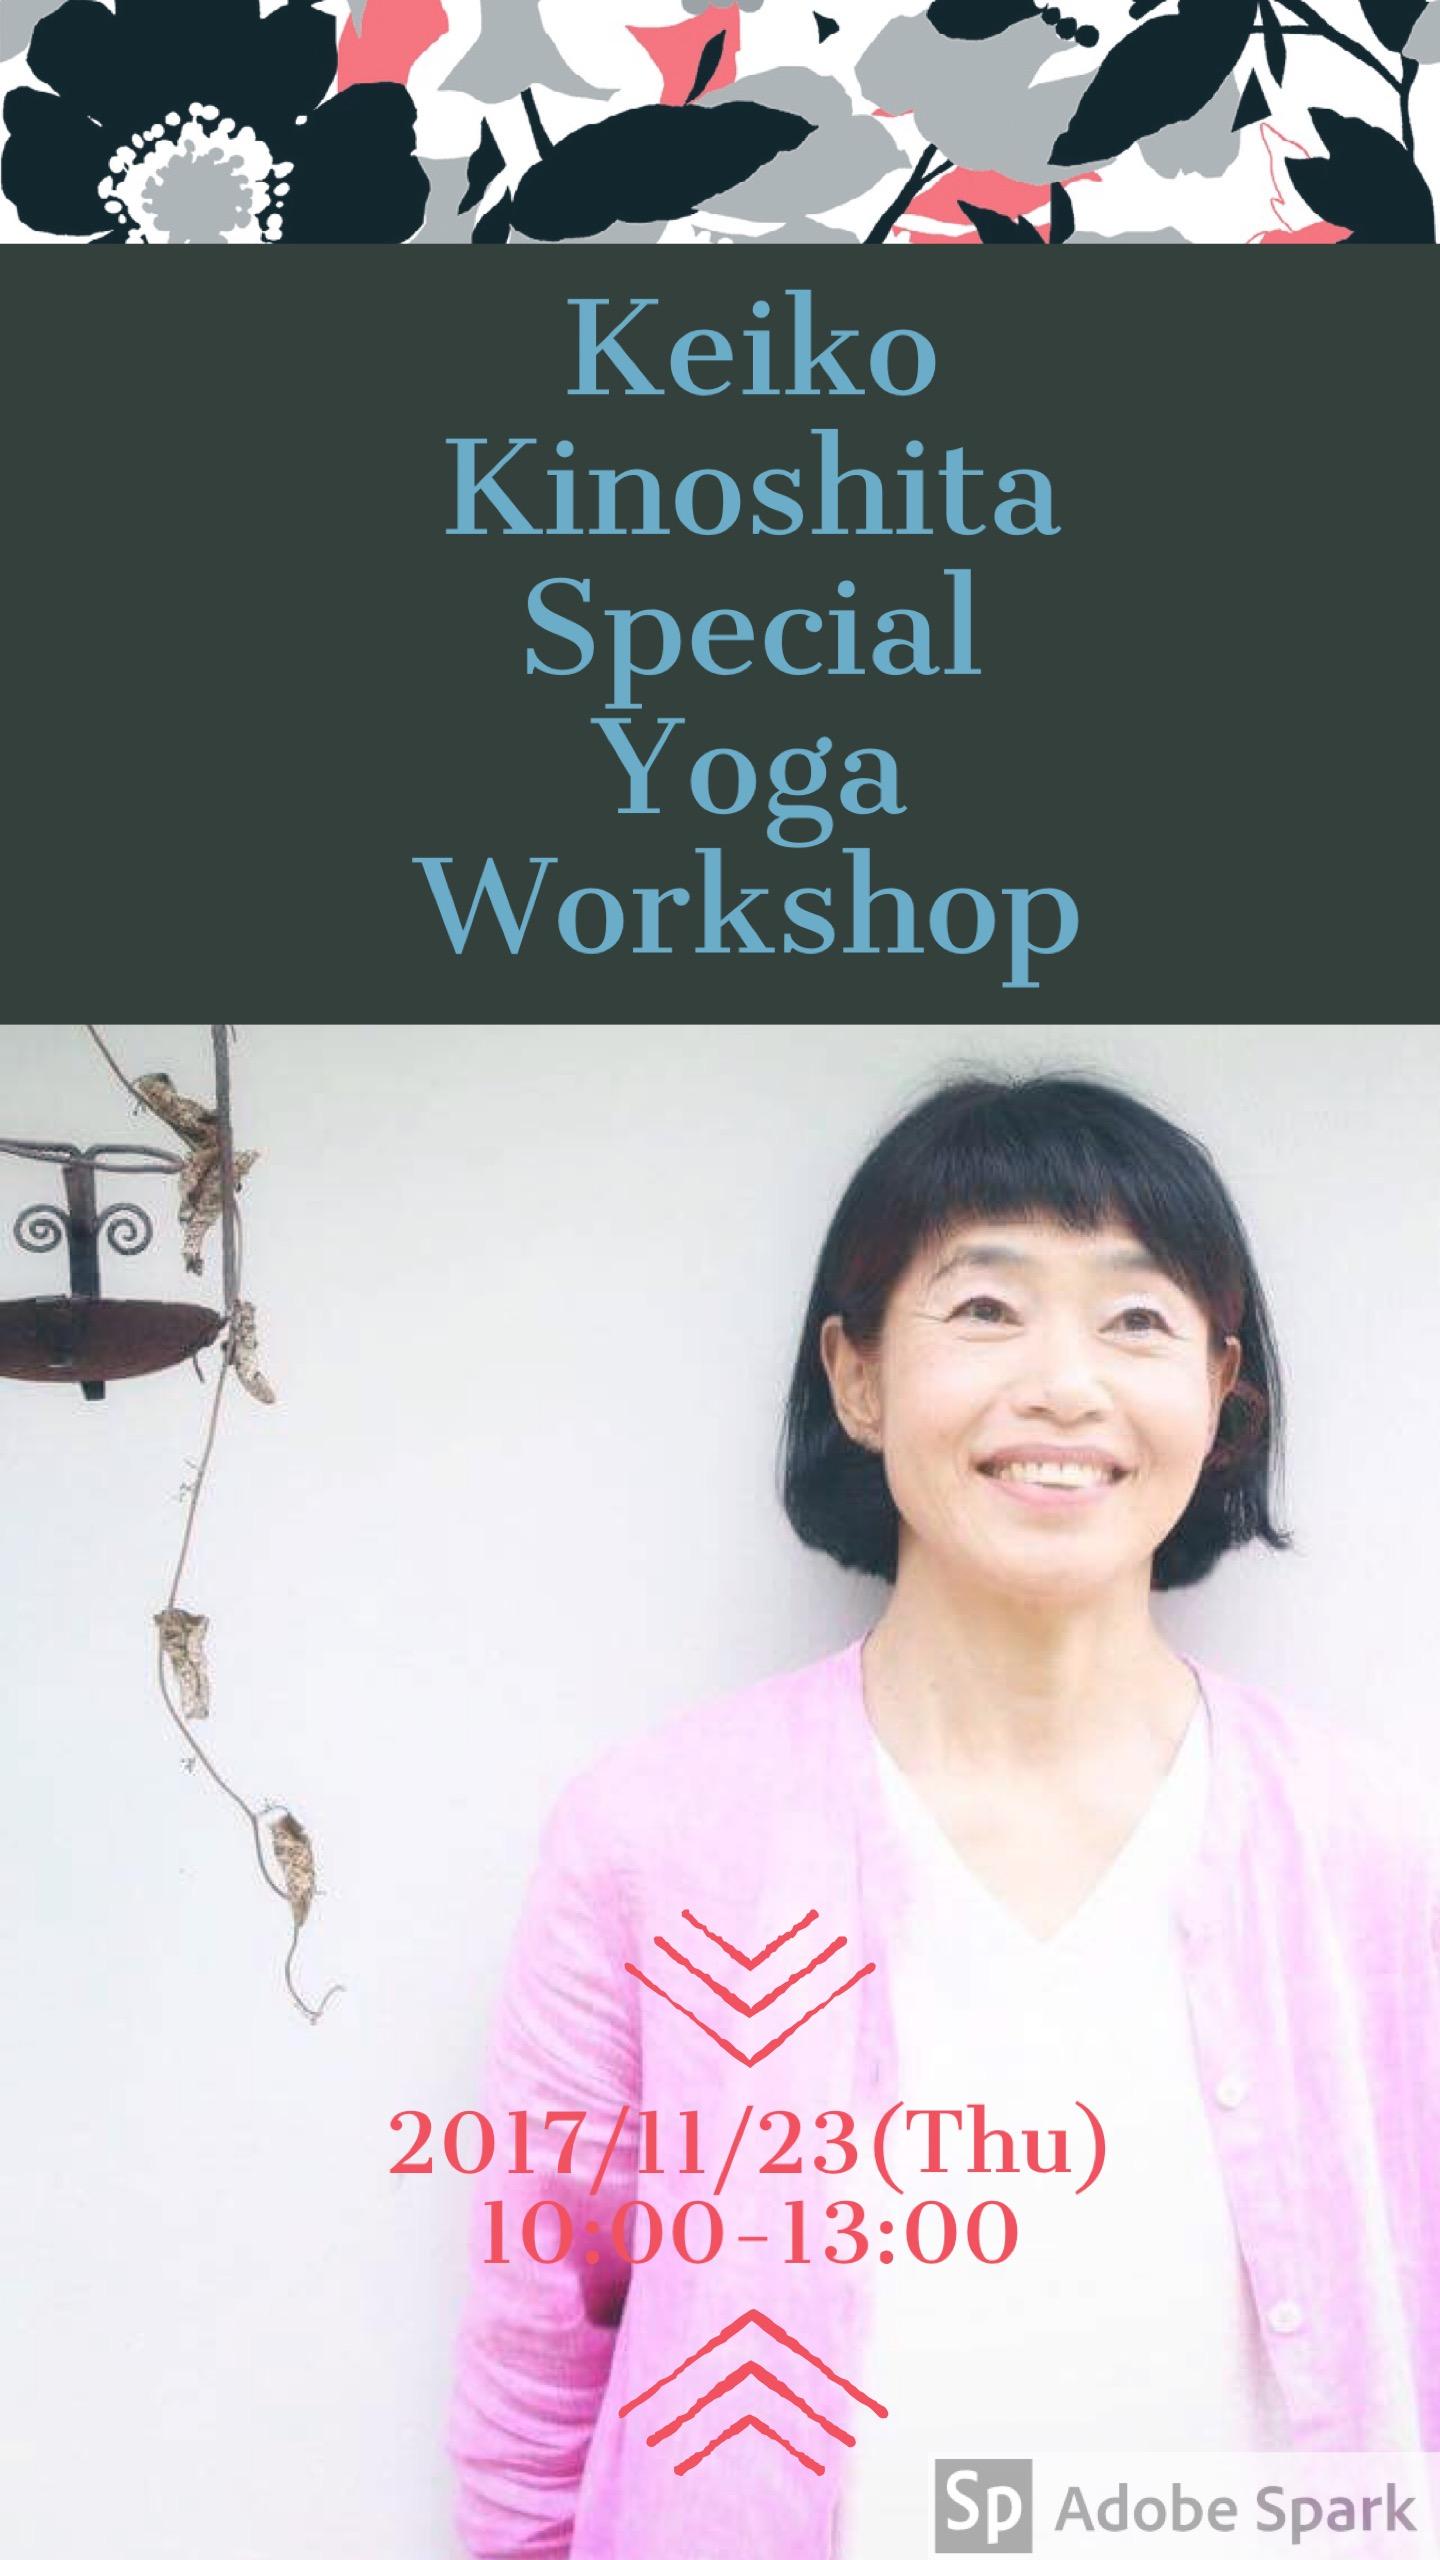 PRAMANA yoga&pilates studio - ◆流派を超えてヨーガのお話と実践◆〜キノシタケイコスペシャルWS〜の写真1